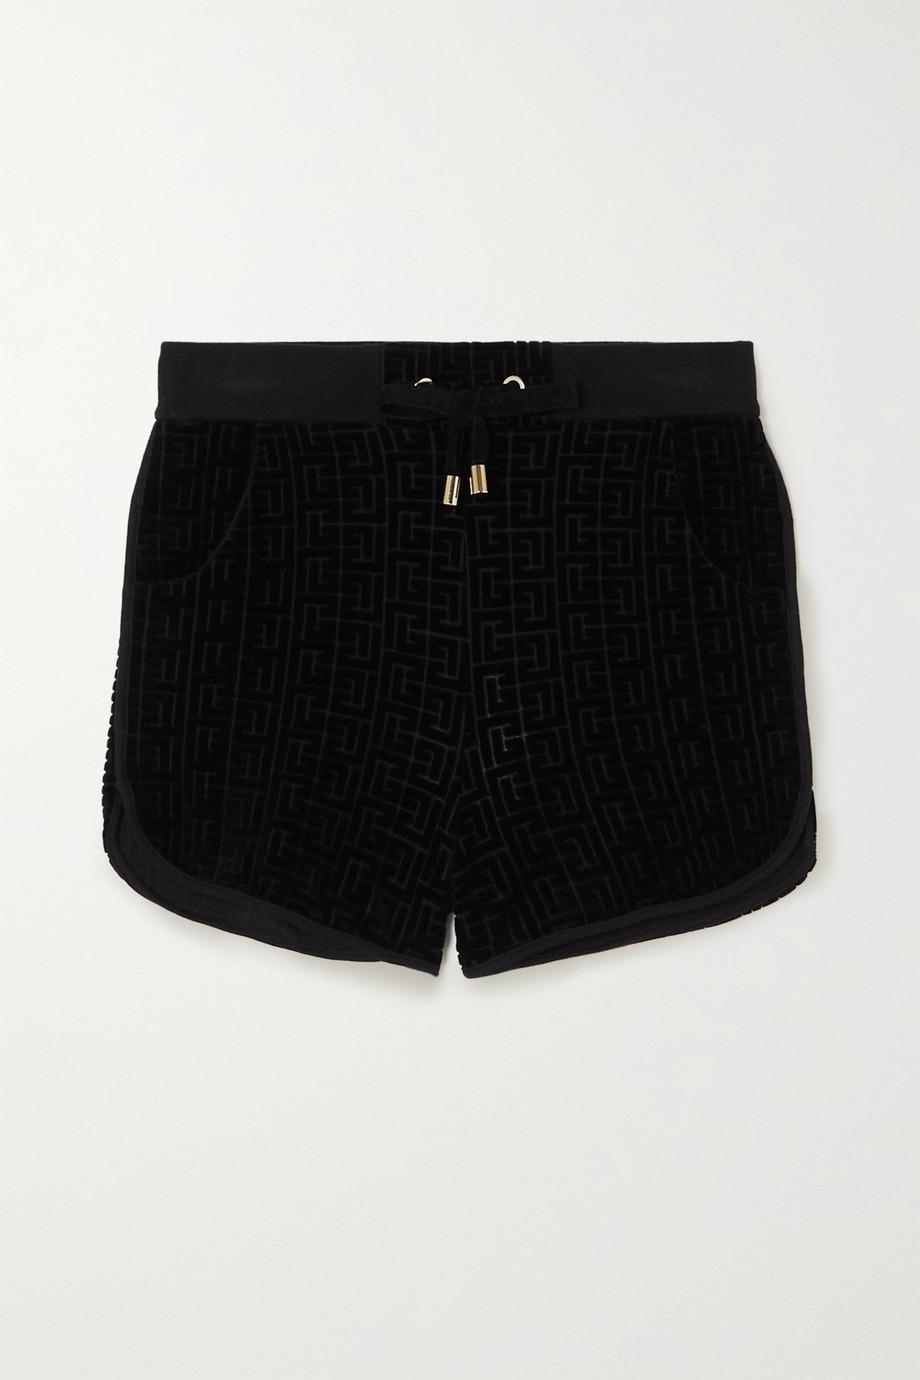 Balmain Flocked cotton-blend shorts